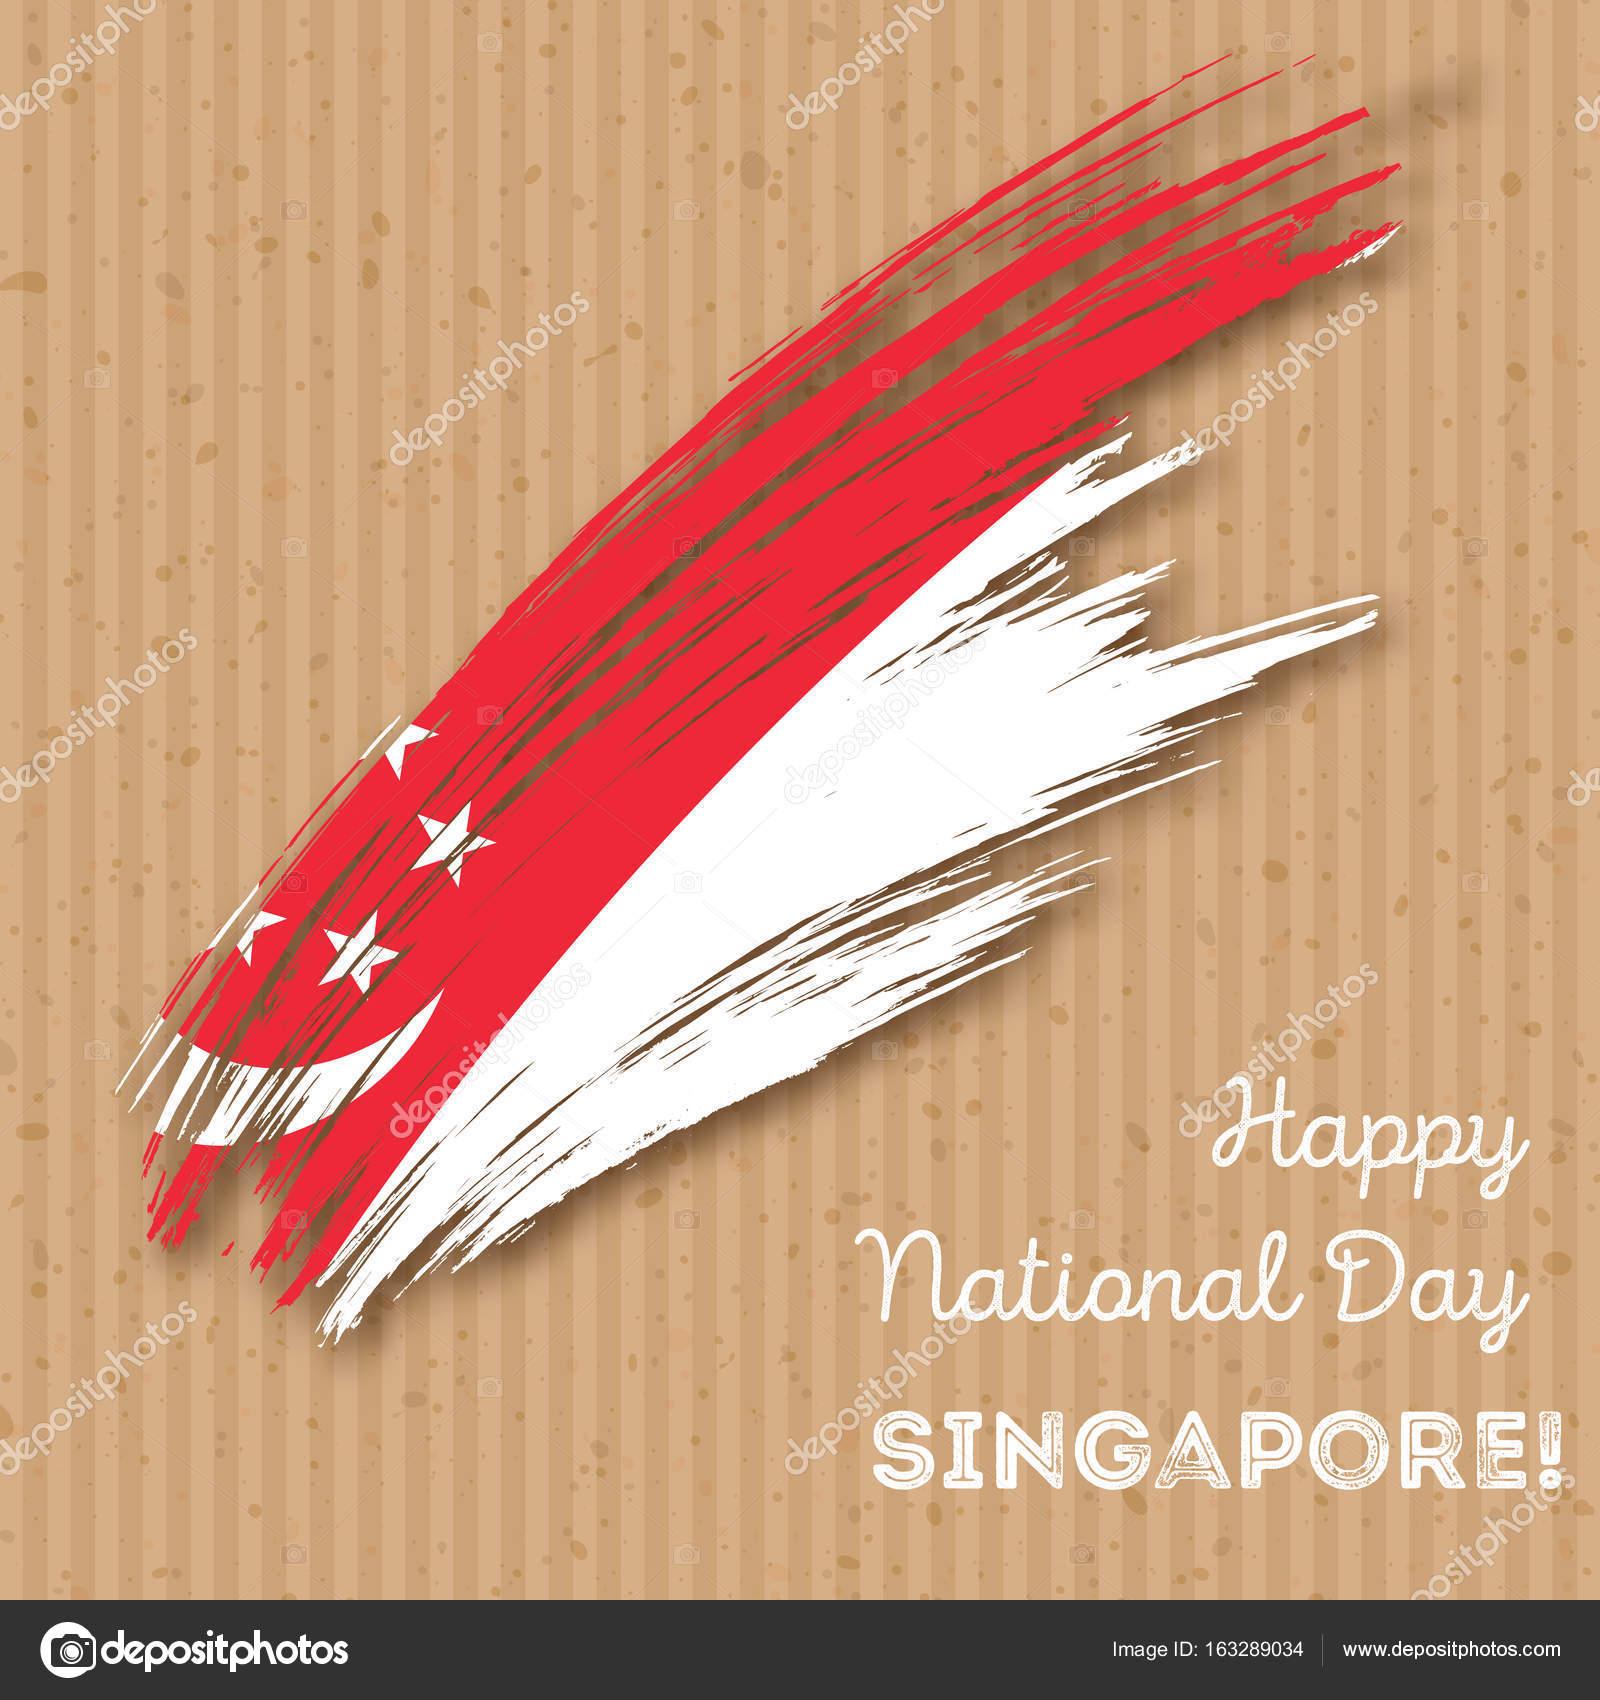 Singapore Independence Day Patriotic Design Expressive Brush Stroke